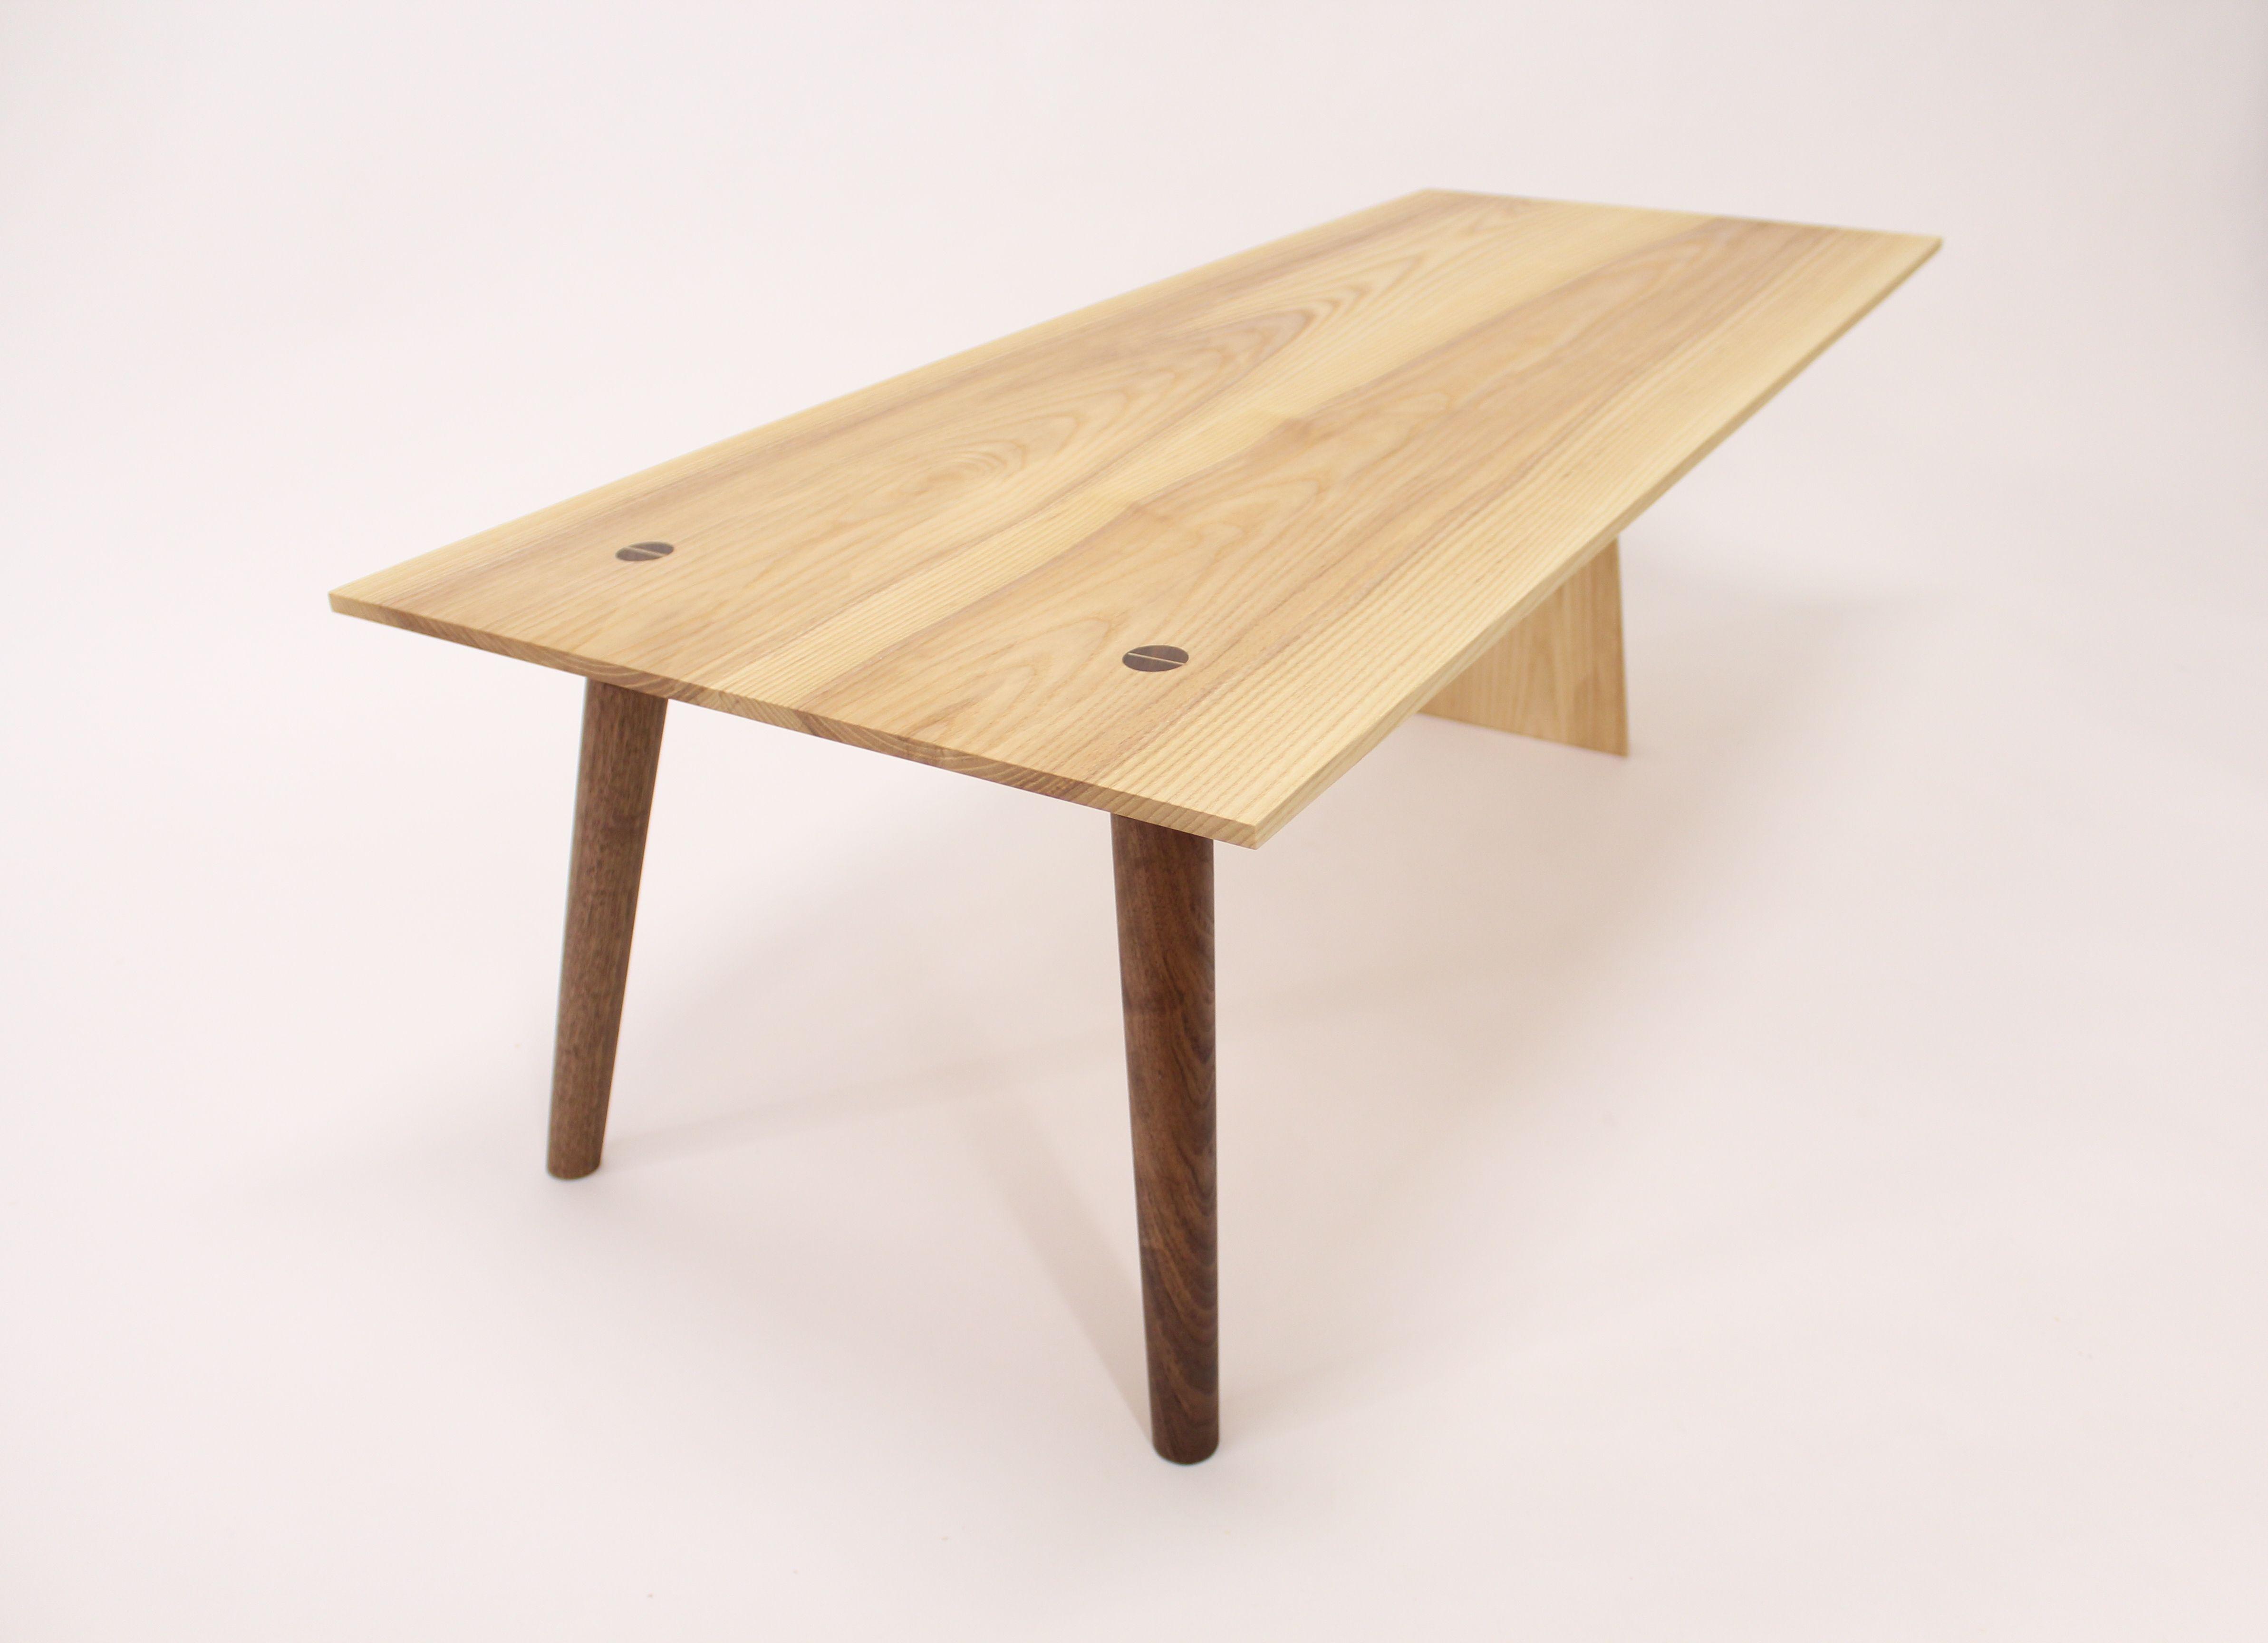 Buy a Handmade Mid Century Modern Ash And Walnut Coffee Table